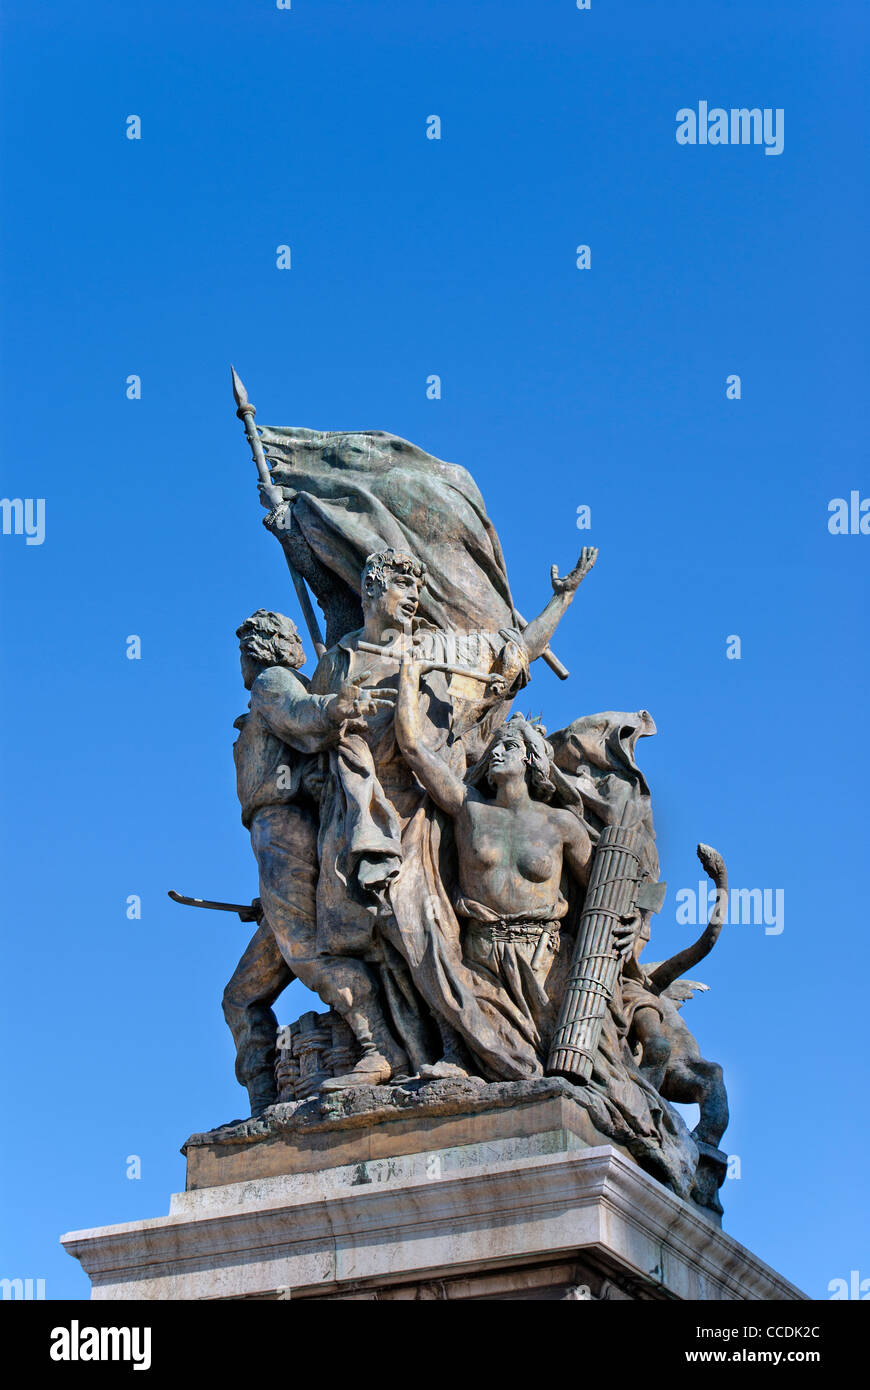 Bronze statue front of Capitolio, Rome, Italy Stock Photo